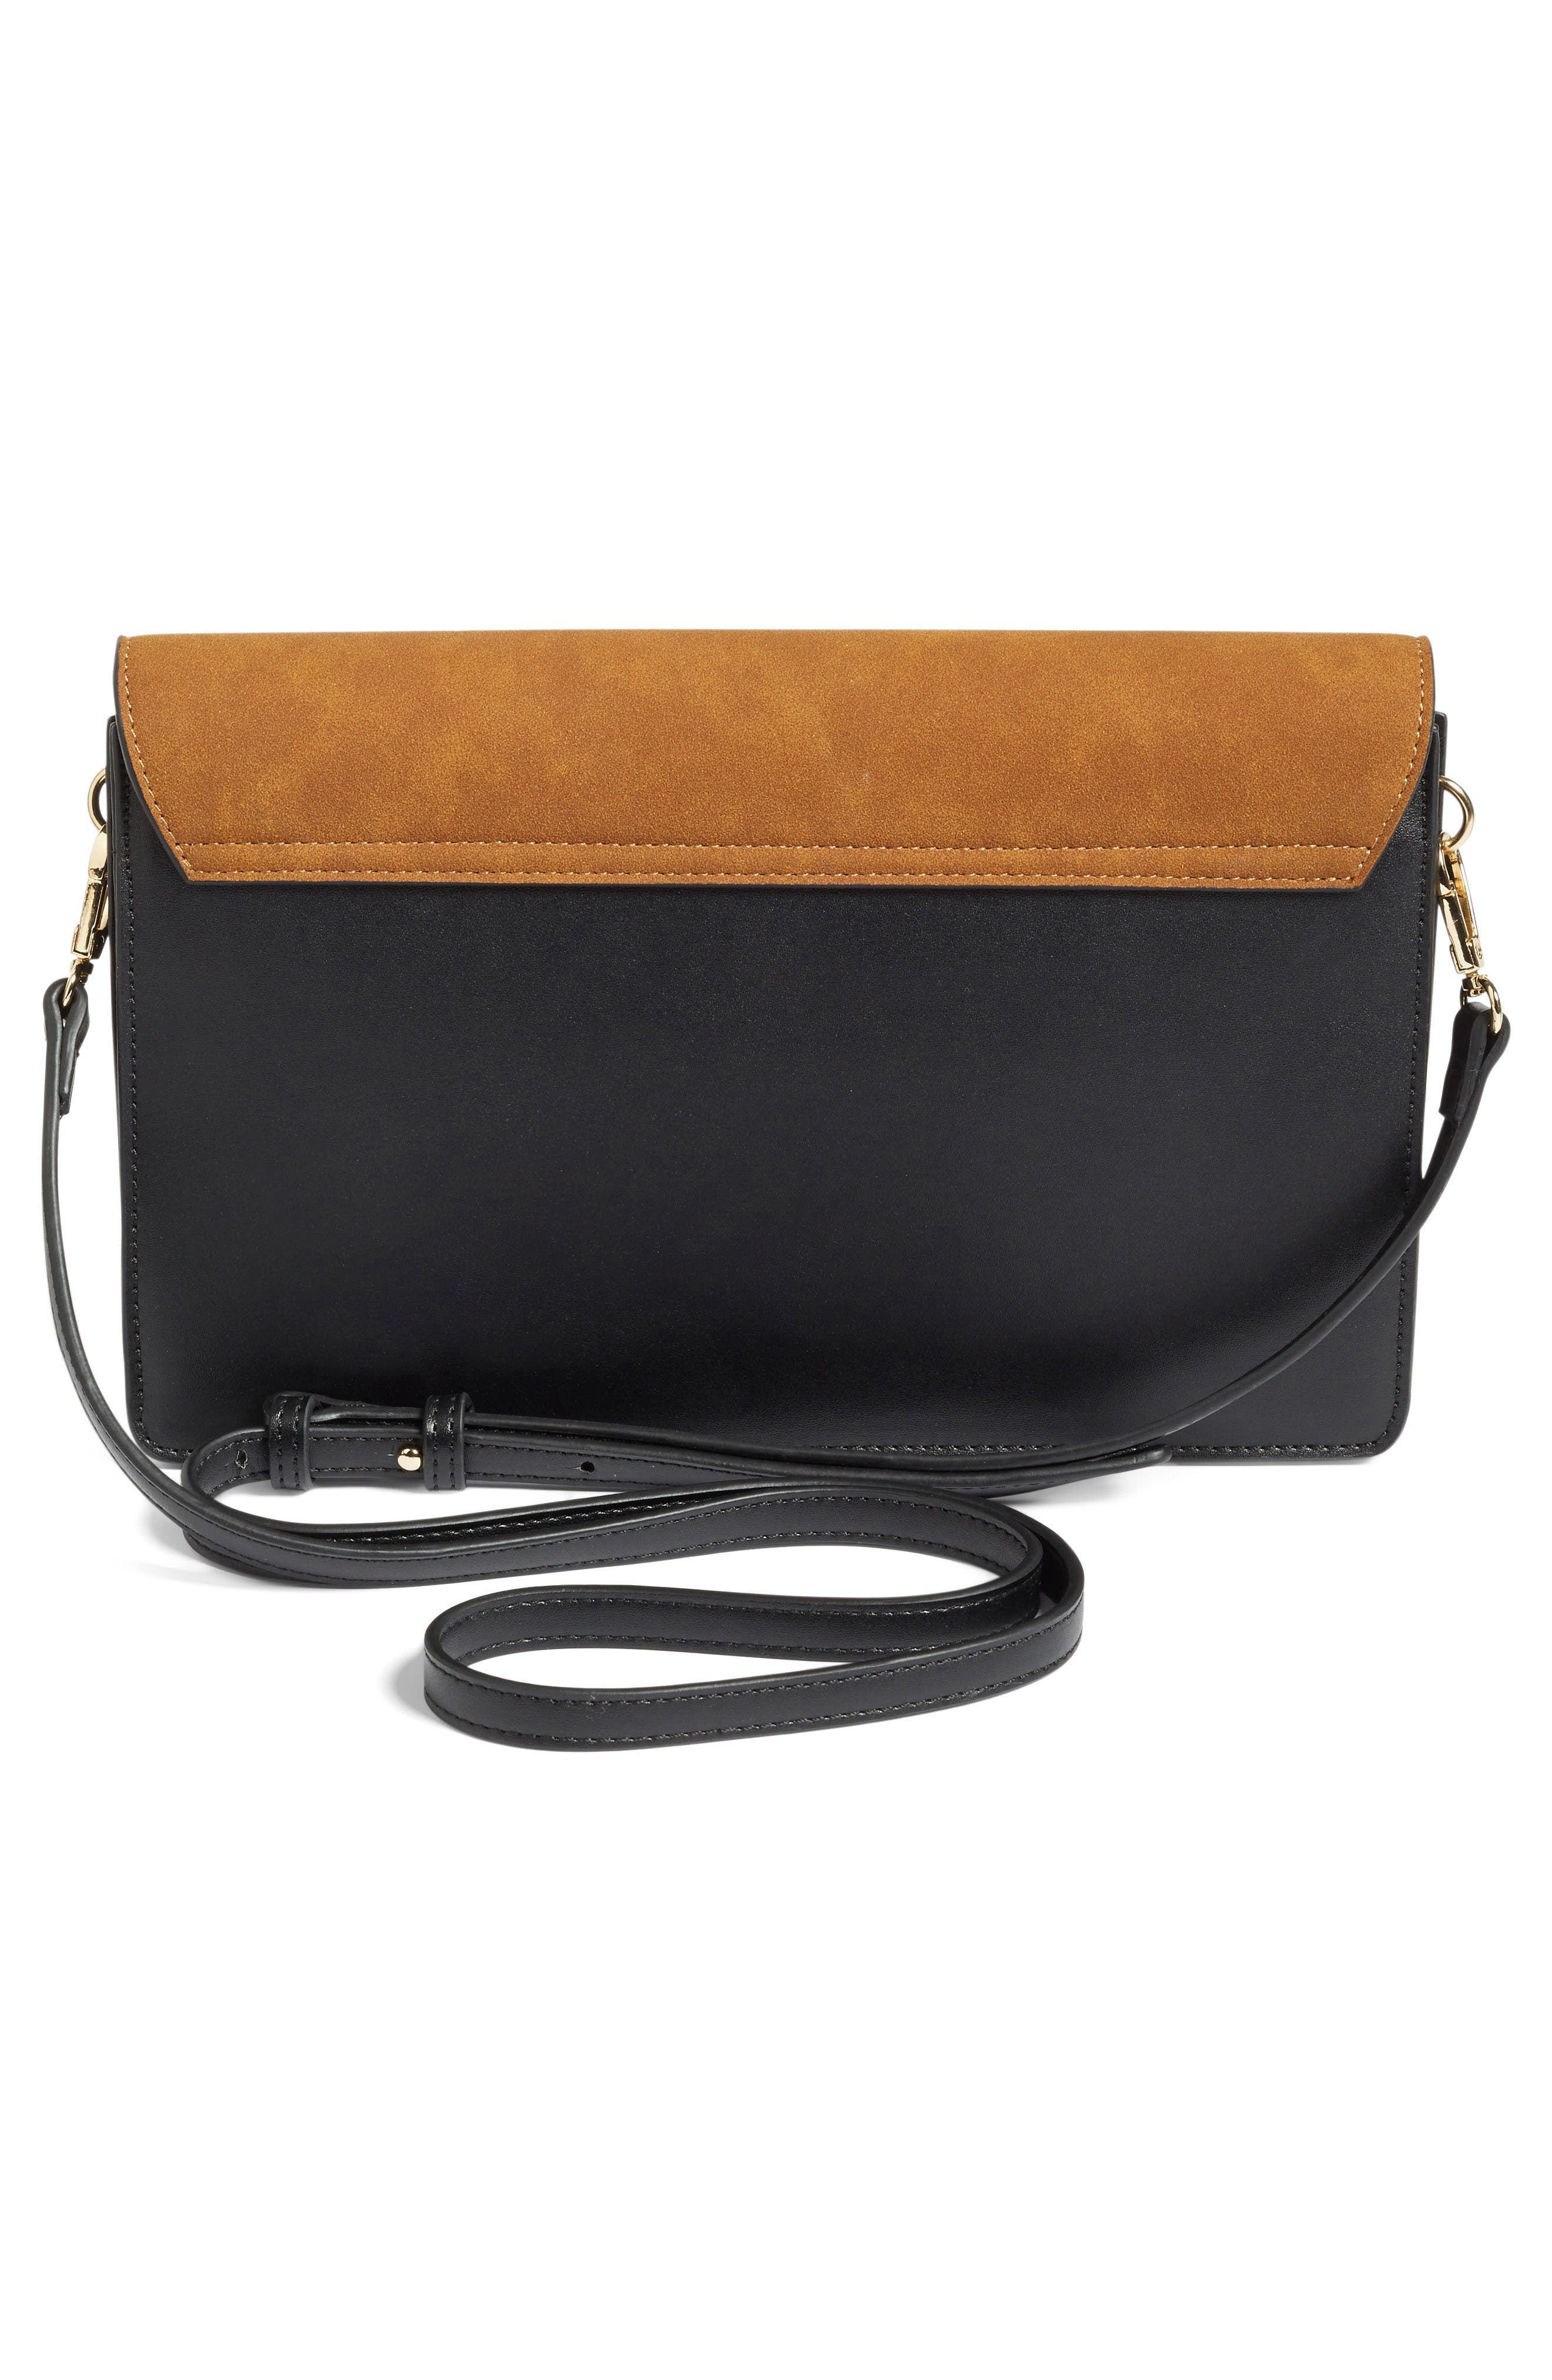 Leighton Colorblock Faux Leather Crossbody Bag,                             Alternate thumbnail 3, color,                             Black/Cognac